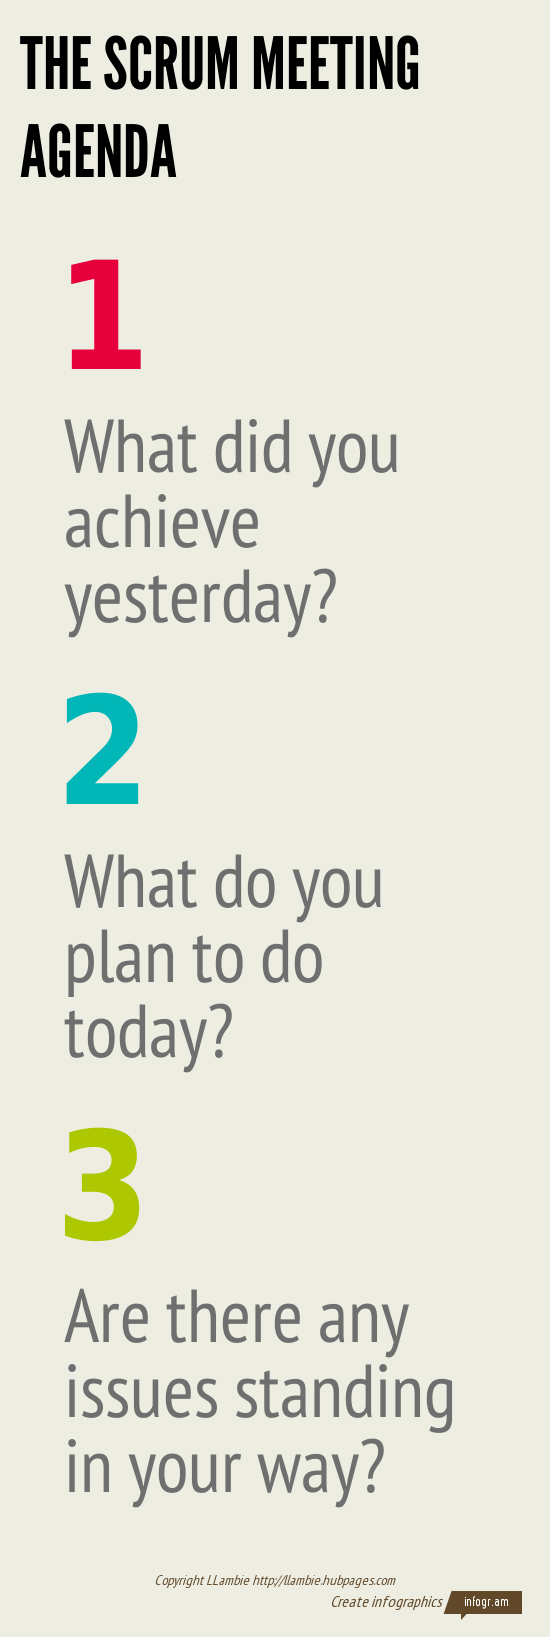 5 Ways to Improve Daily Scrum Meetings | Ondas, Productividad y Gestion